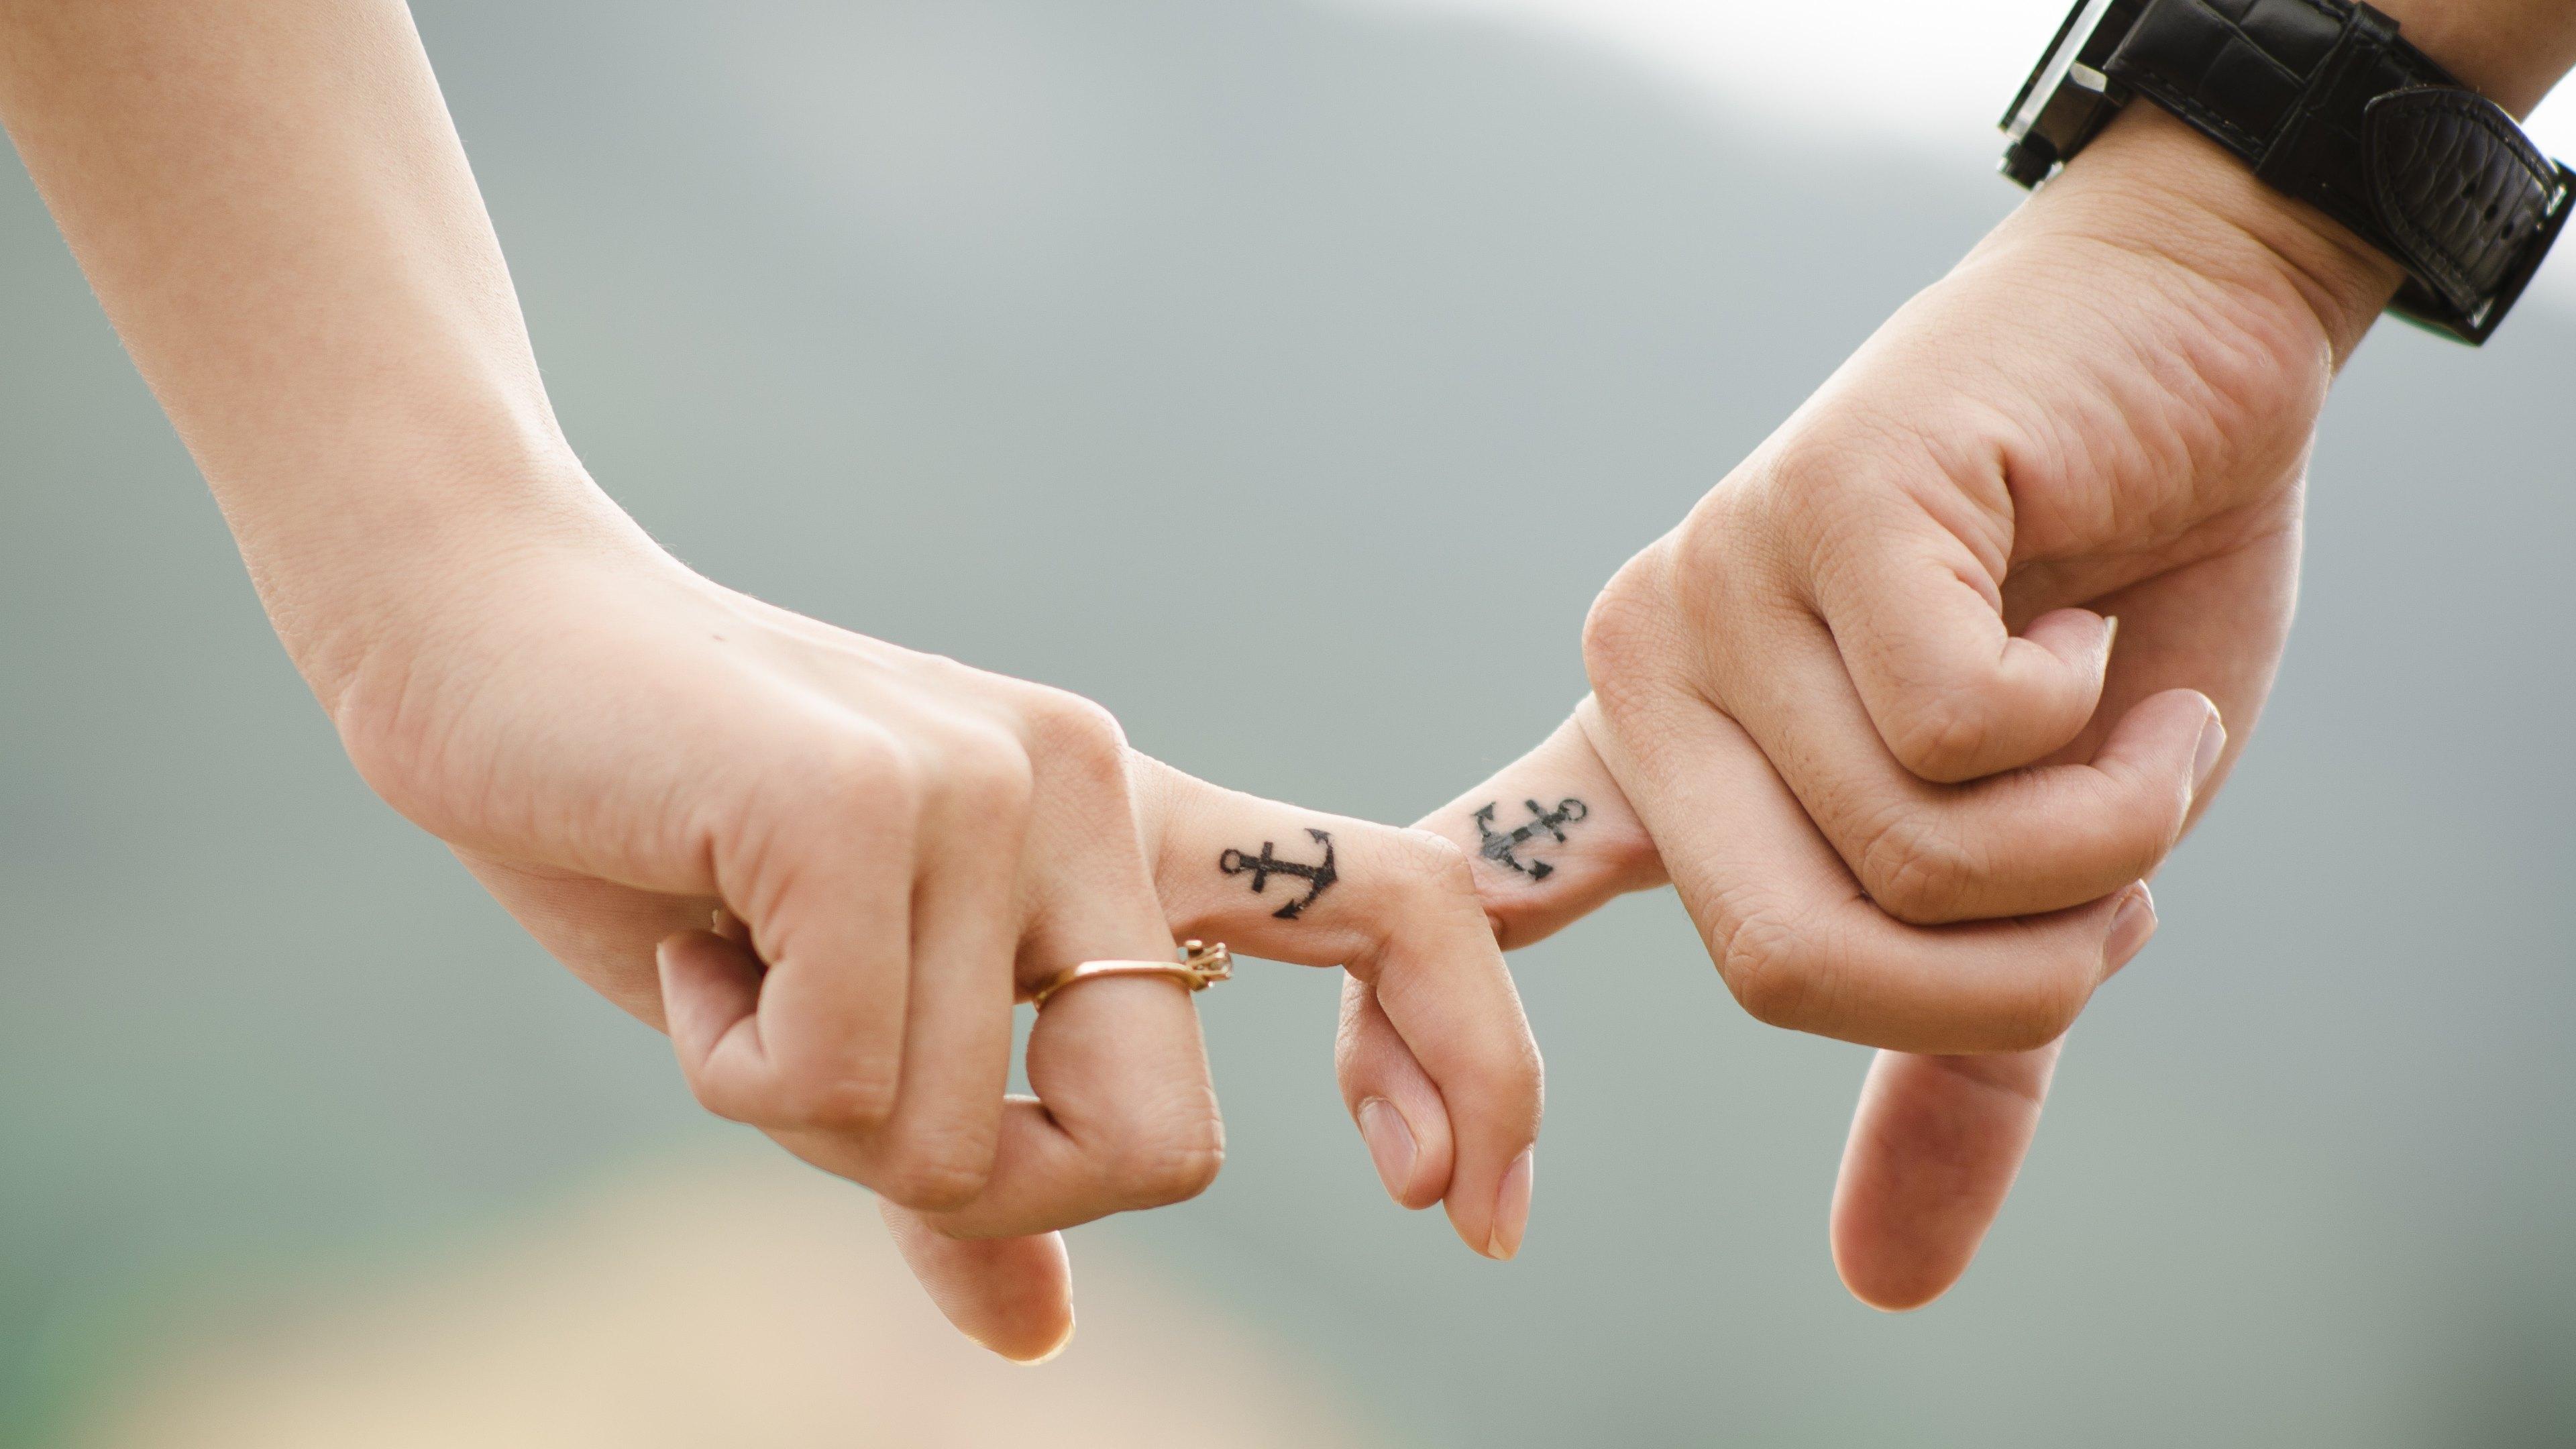 Hd wallpaper love couple - Wallpaper Hands Love Couple Family